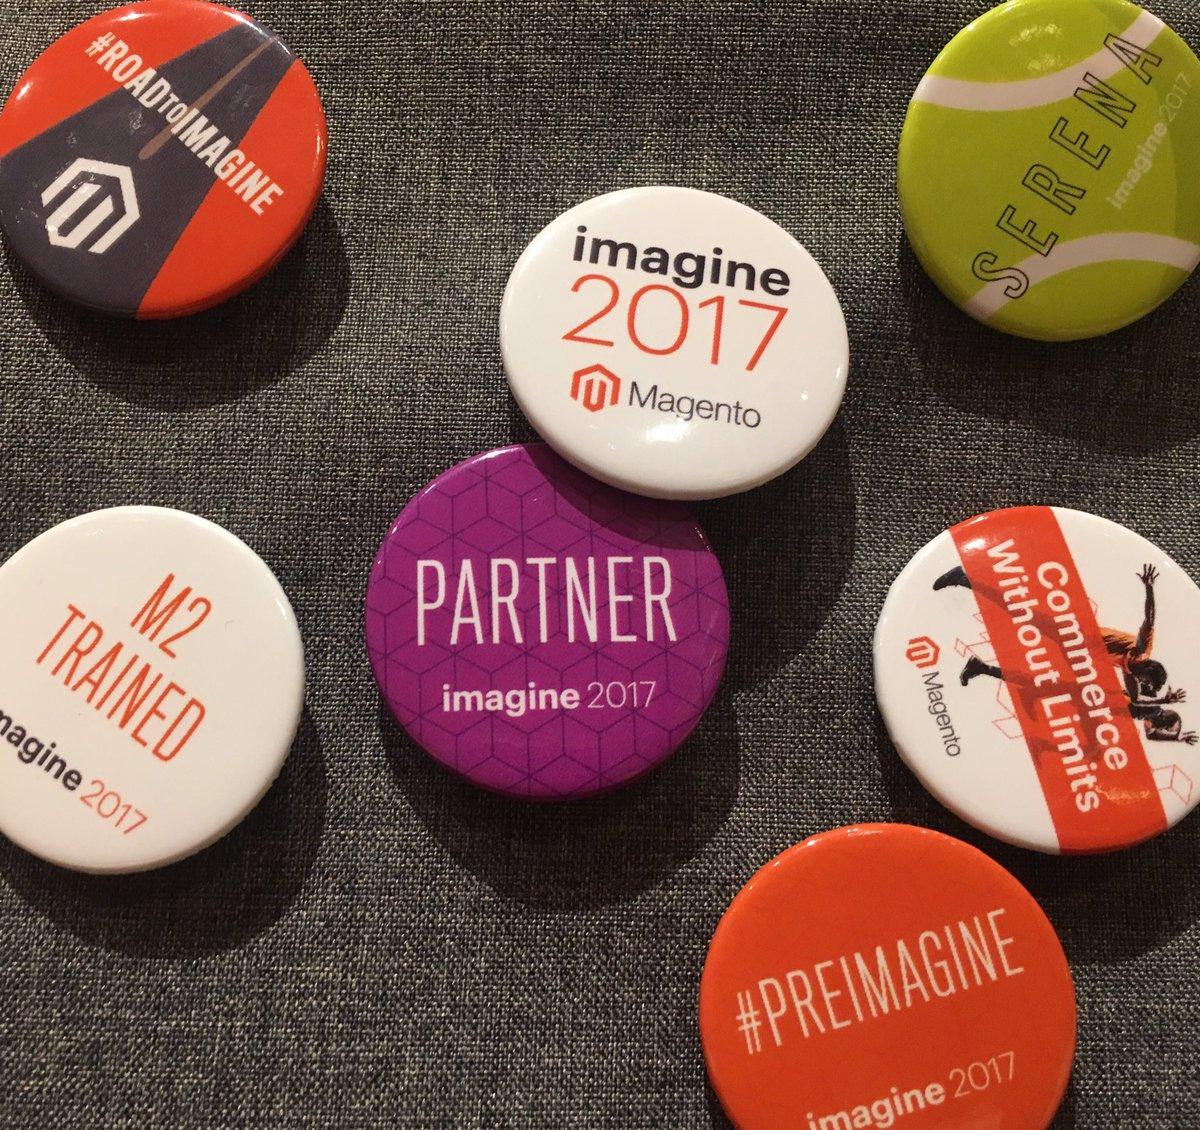 atwixcom: Coolest pins at #Magentoimagine registration! #magento #magentoimagine2017 https://t.co/wbWj2zyTZx